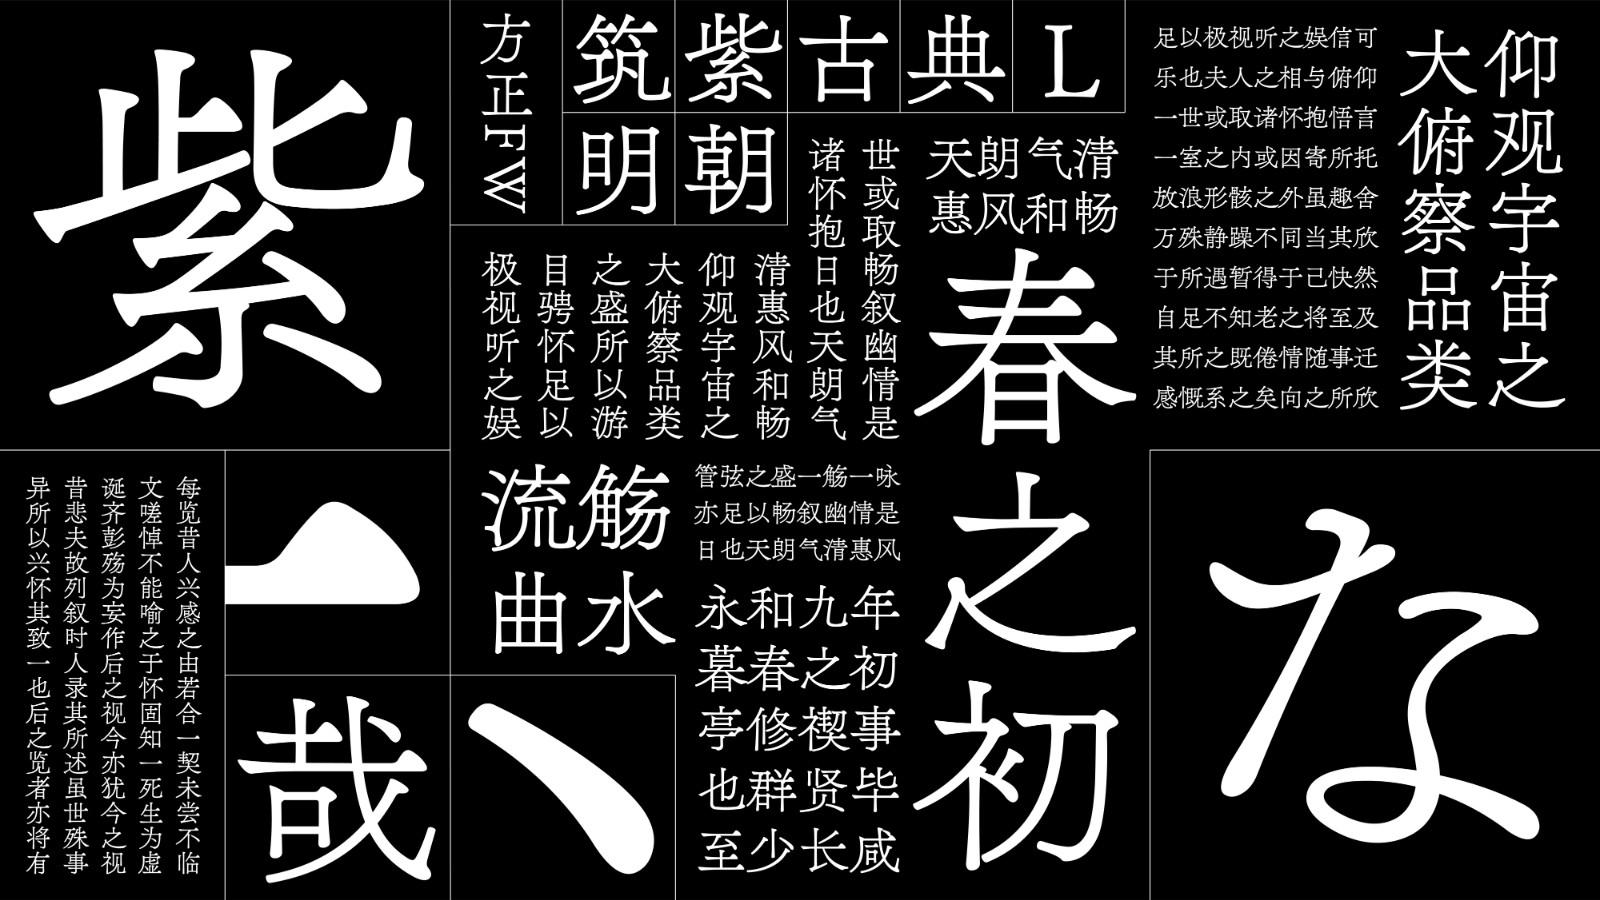 https://ft-bk1.oss-cn-zhangjiakou.aliyuncs.com/Public/Uploads/img/n_content_20201210175729_9347.jpg